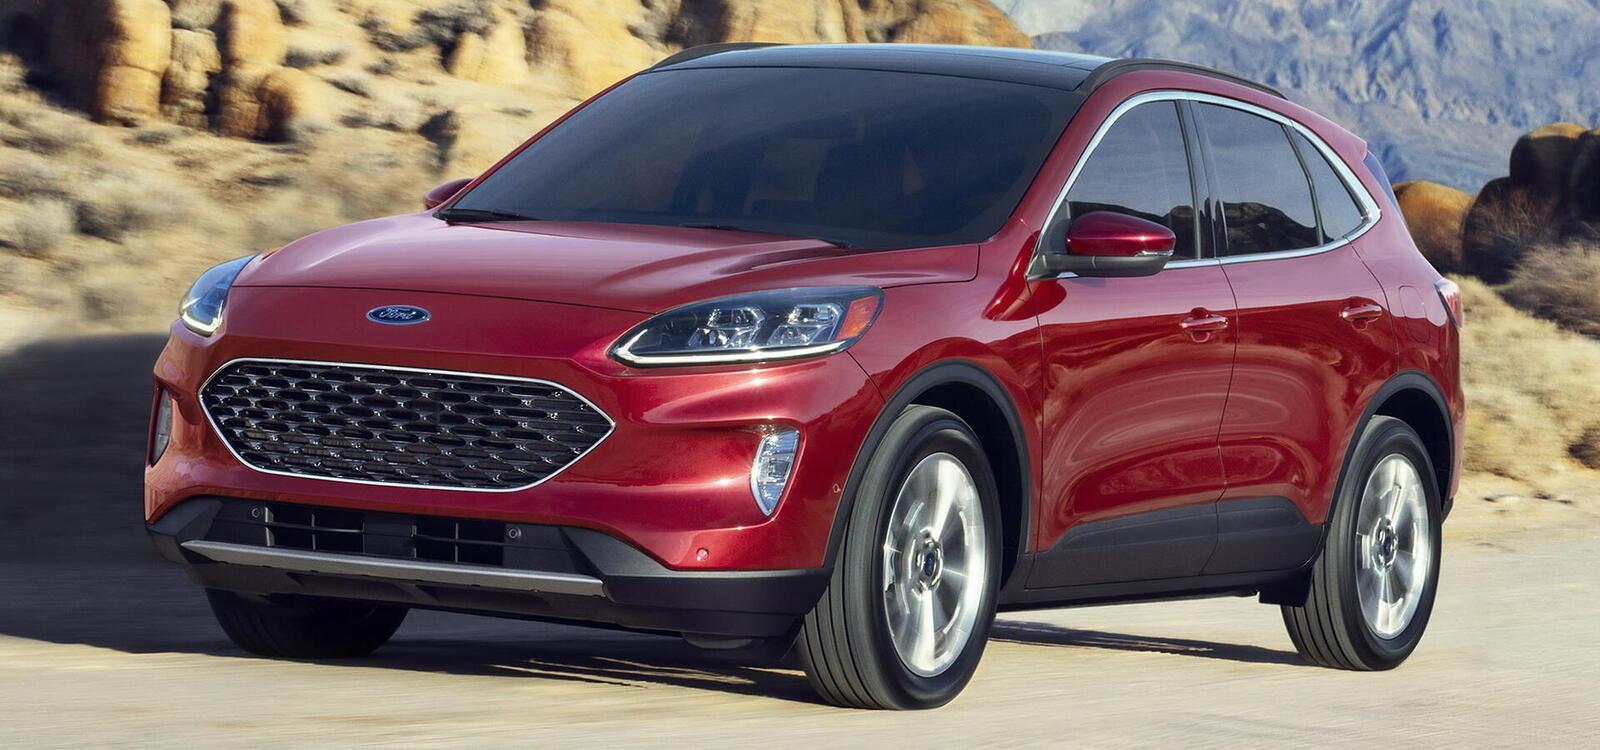 ford-escape-2020-lo-thoi-gian-ra-mat-thi-truong-viet-nam-di-kem-dong-co-moi-2.jpg